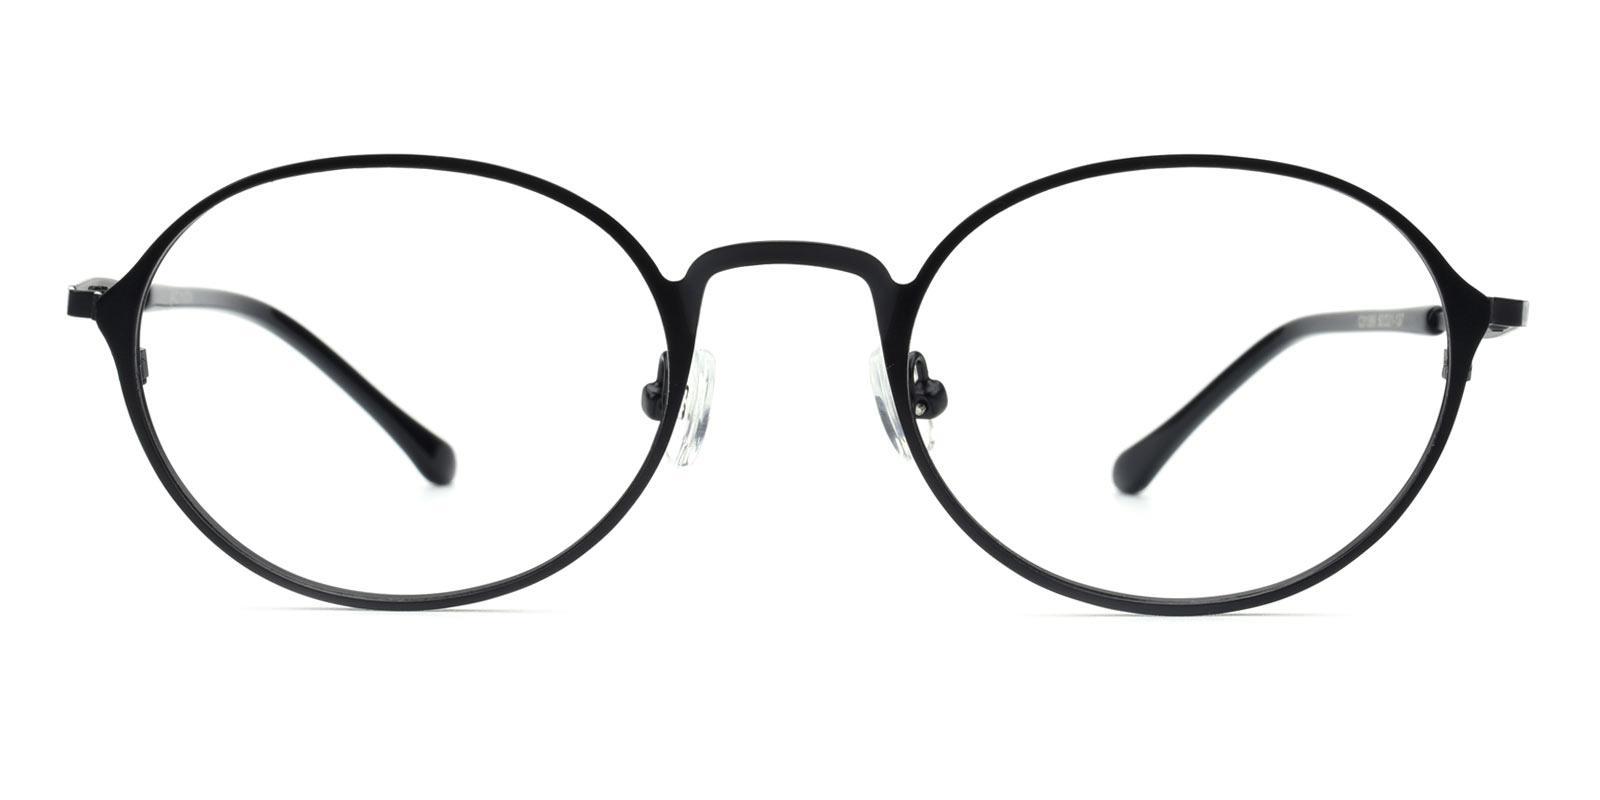 Gulio-Black-Oval-Metal-Eyeglasses-additional2